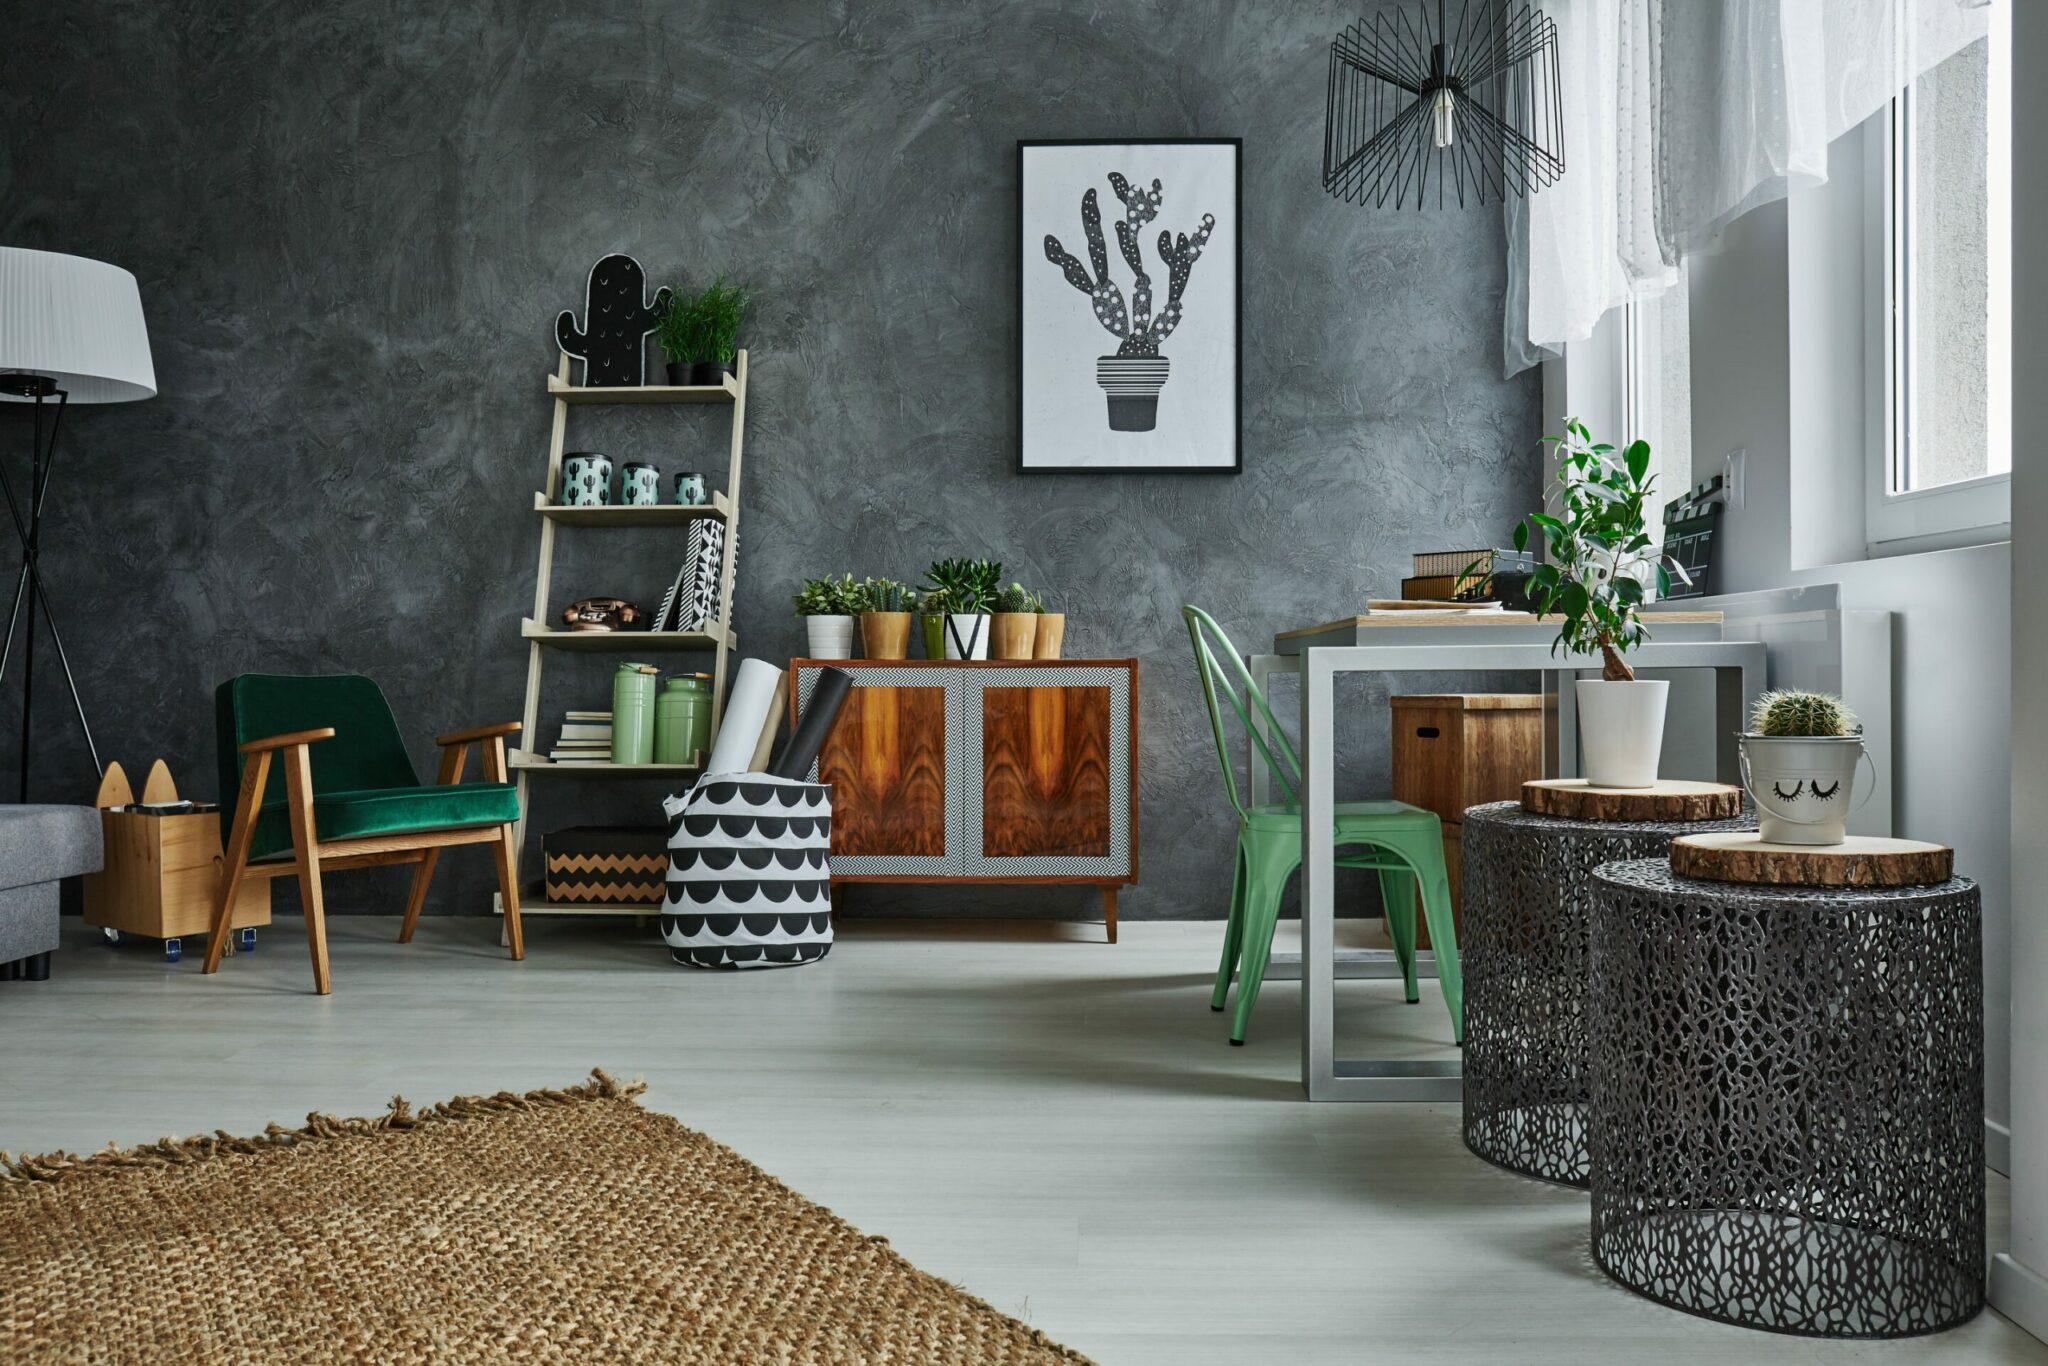 Room with grey wall stucco